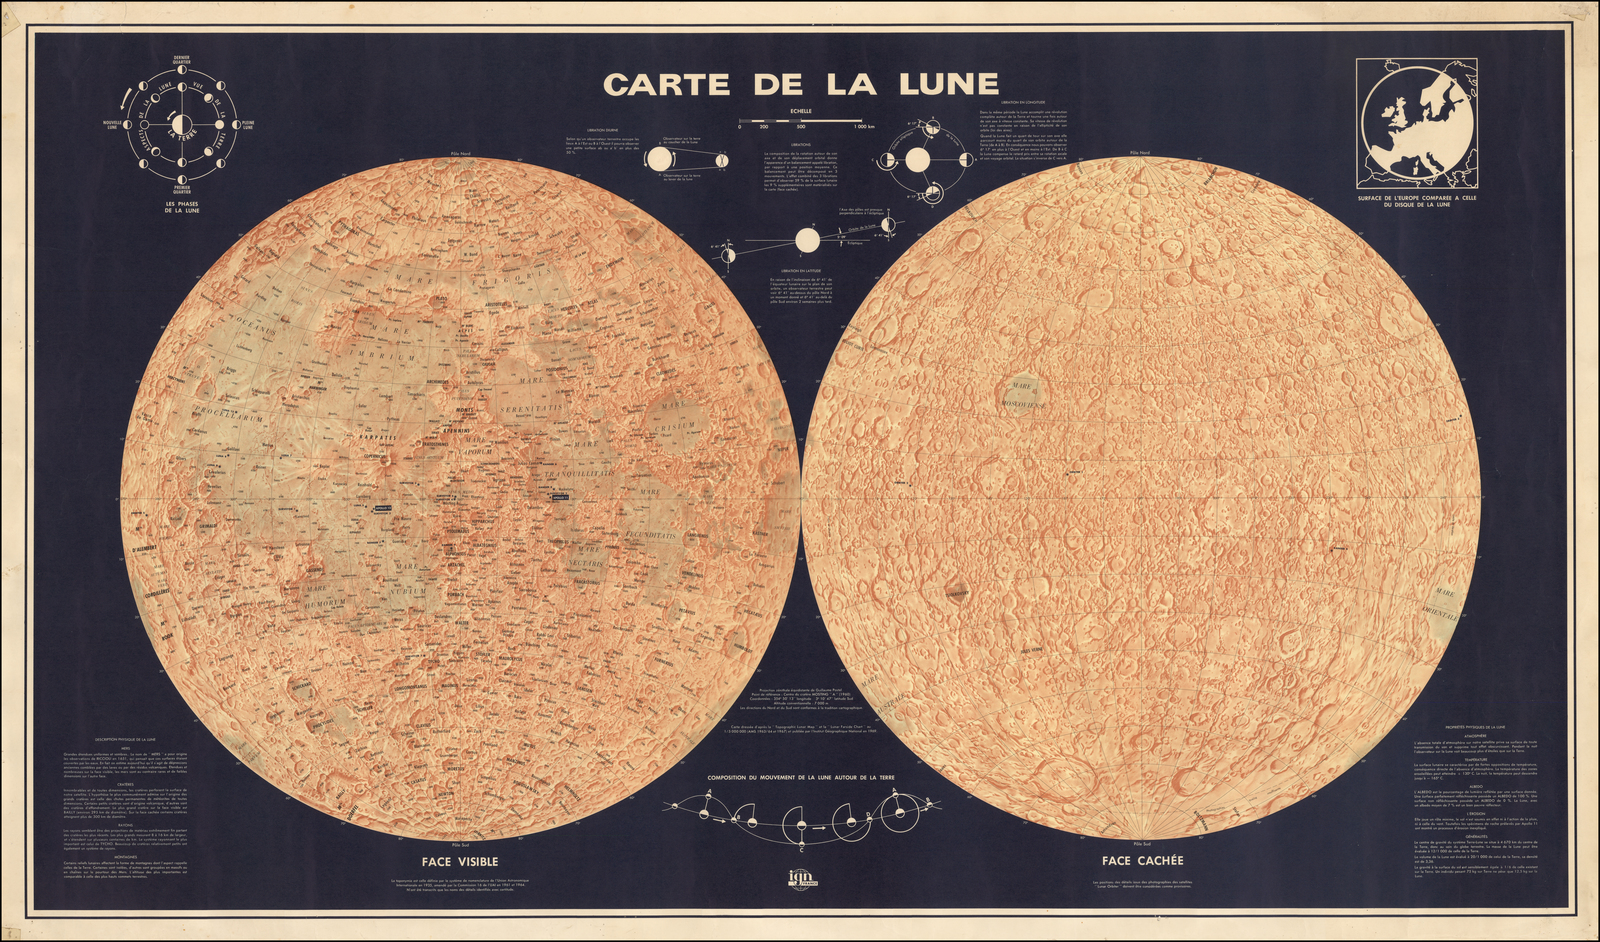 Carte Canada Ign.Moon Carte De La Lune Barry Lawrence Ruderman Antique